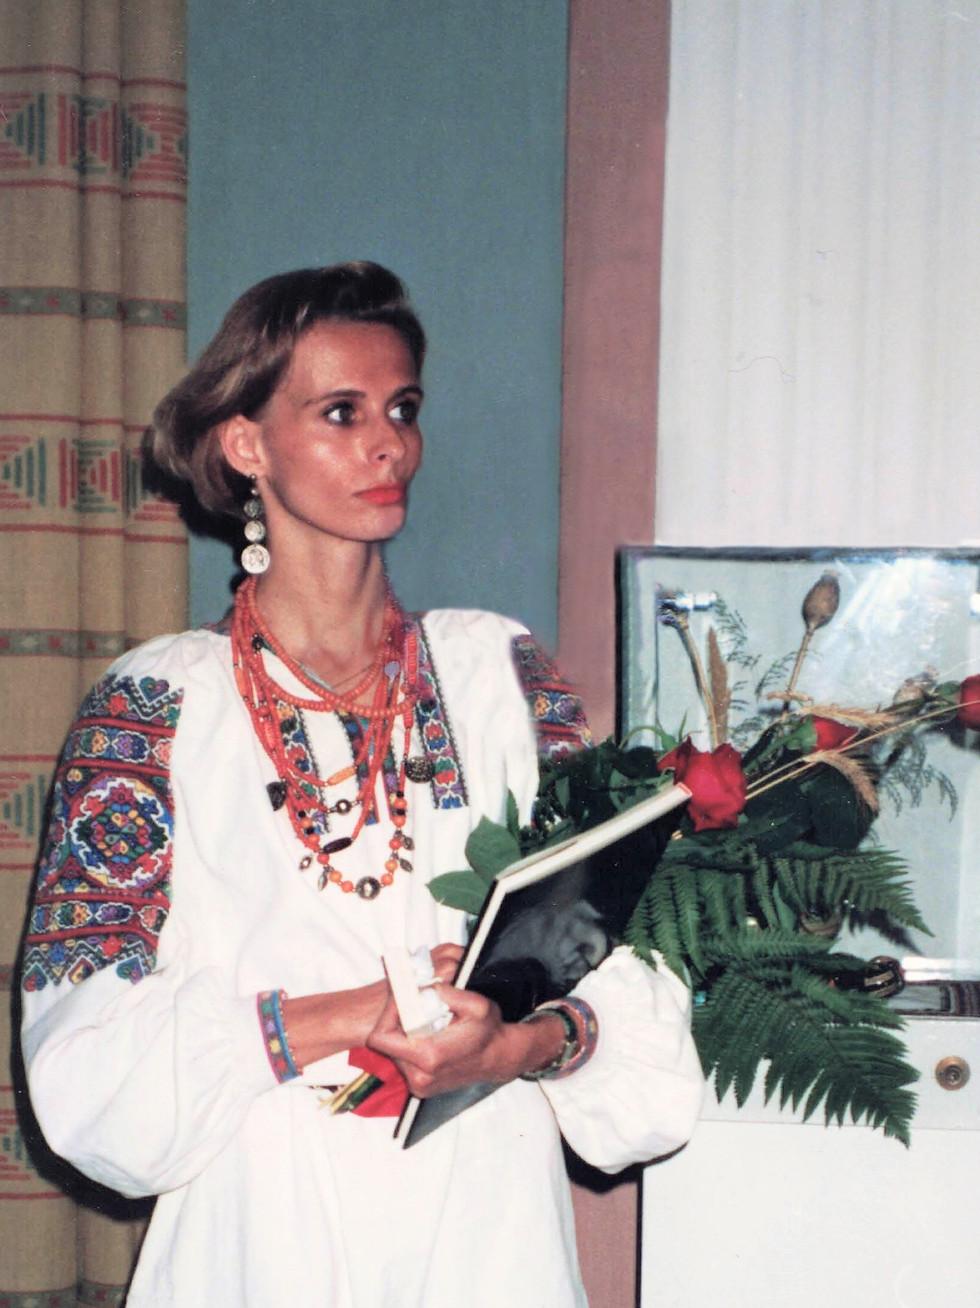 Opening of my pysanka and ceramics exhibit in the city of Kaniv, Ukraine